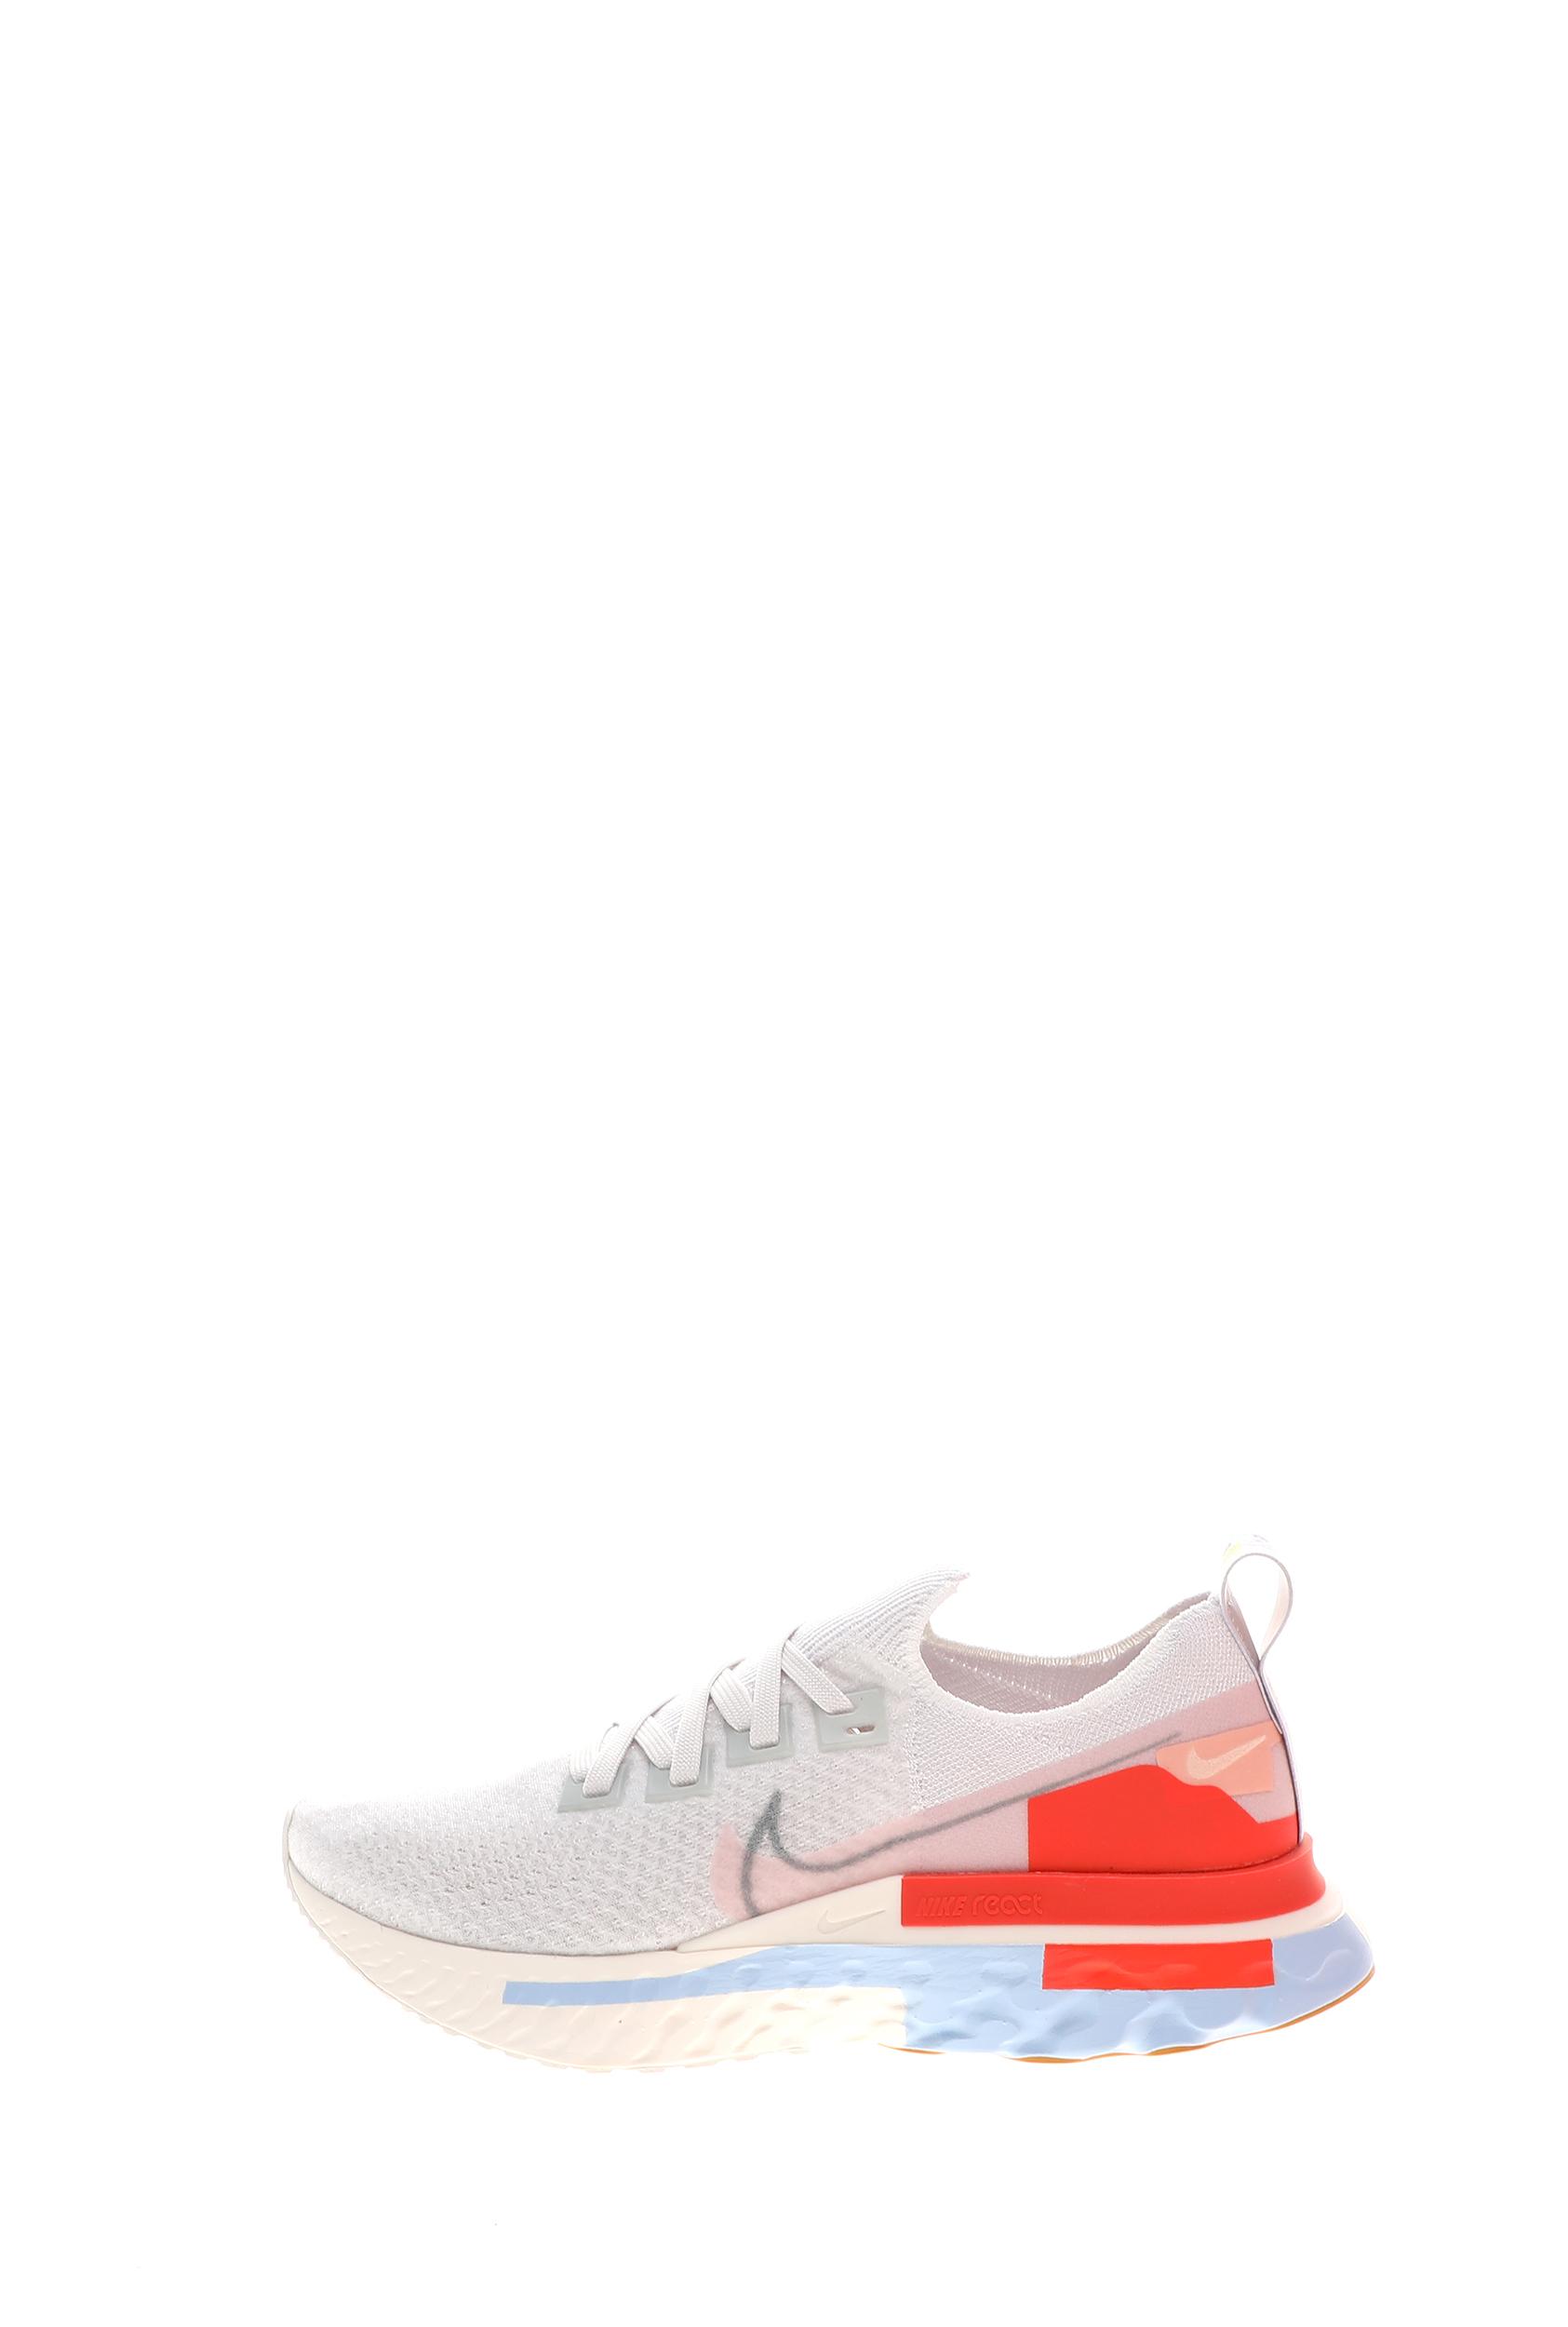 NIKE – Γυναικεία αθλητικά παπούτσια NIKE WMNS REACT INFINITY RUN FK PRM έκρου